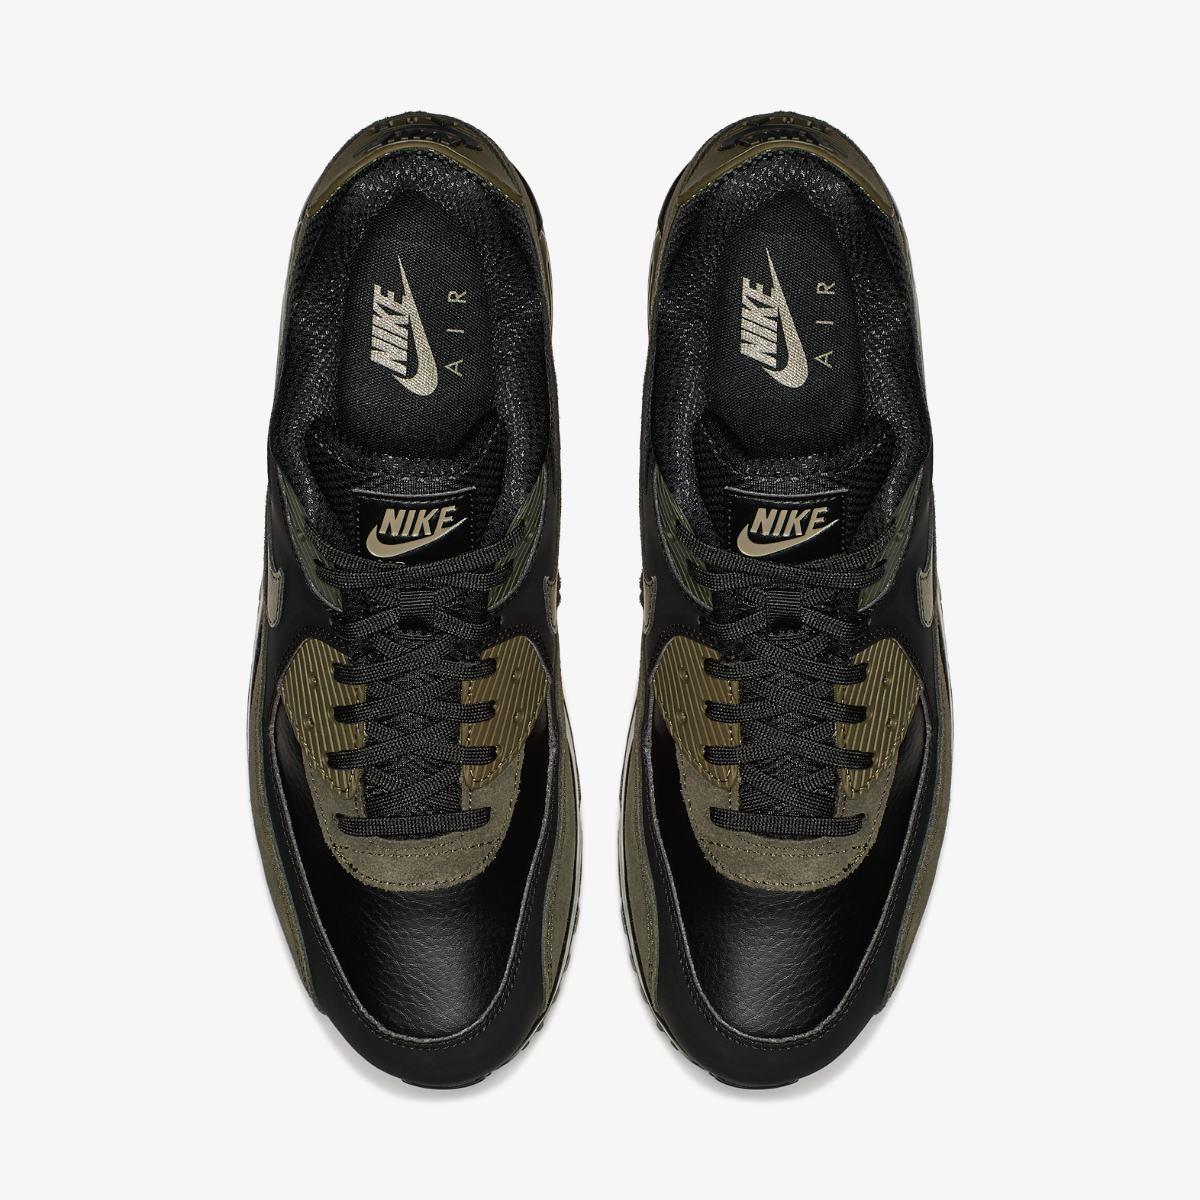 34977f04 Кроссовки Nike AIR MAX 90 LEATHER 302519-014 купить | deltasport.ua